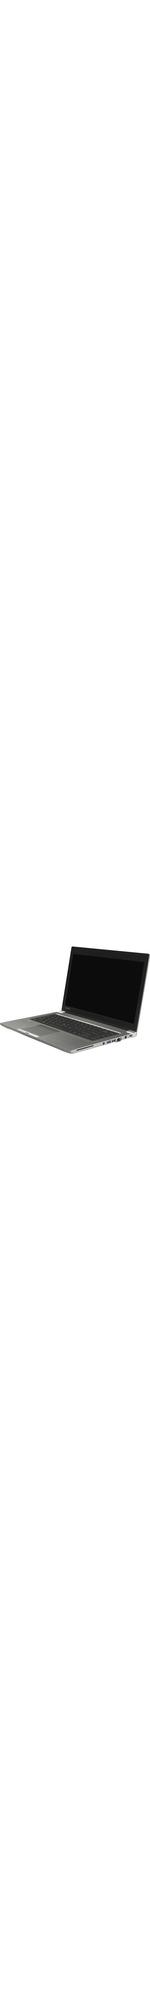 Toshiba Tecra Z40-C-12X 35.6 cm 14And#34; LCD Notebook - Intel Core i5 6th Gen i5-6200U Dual-core